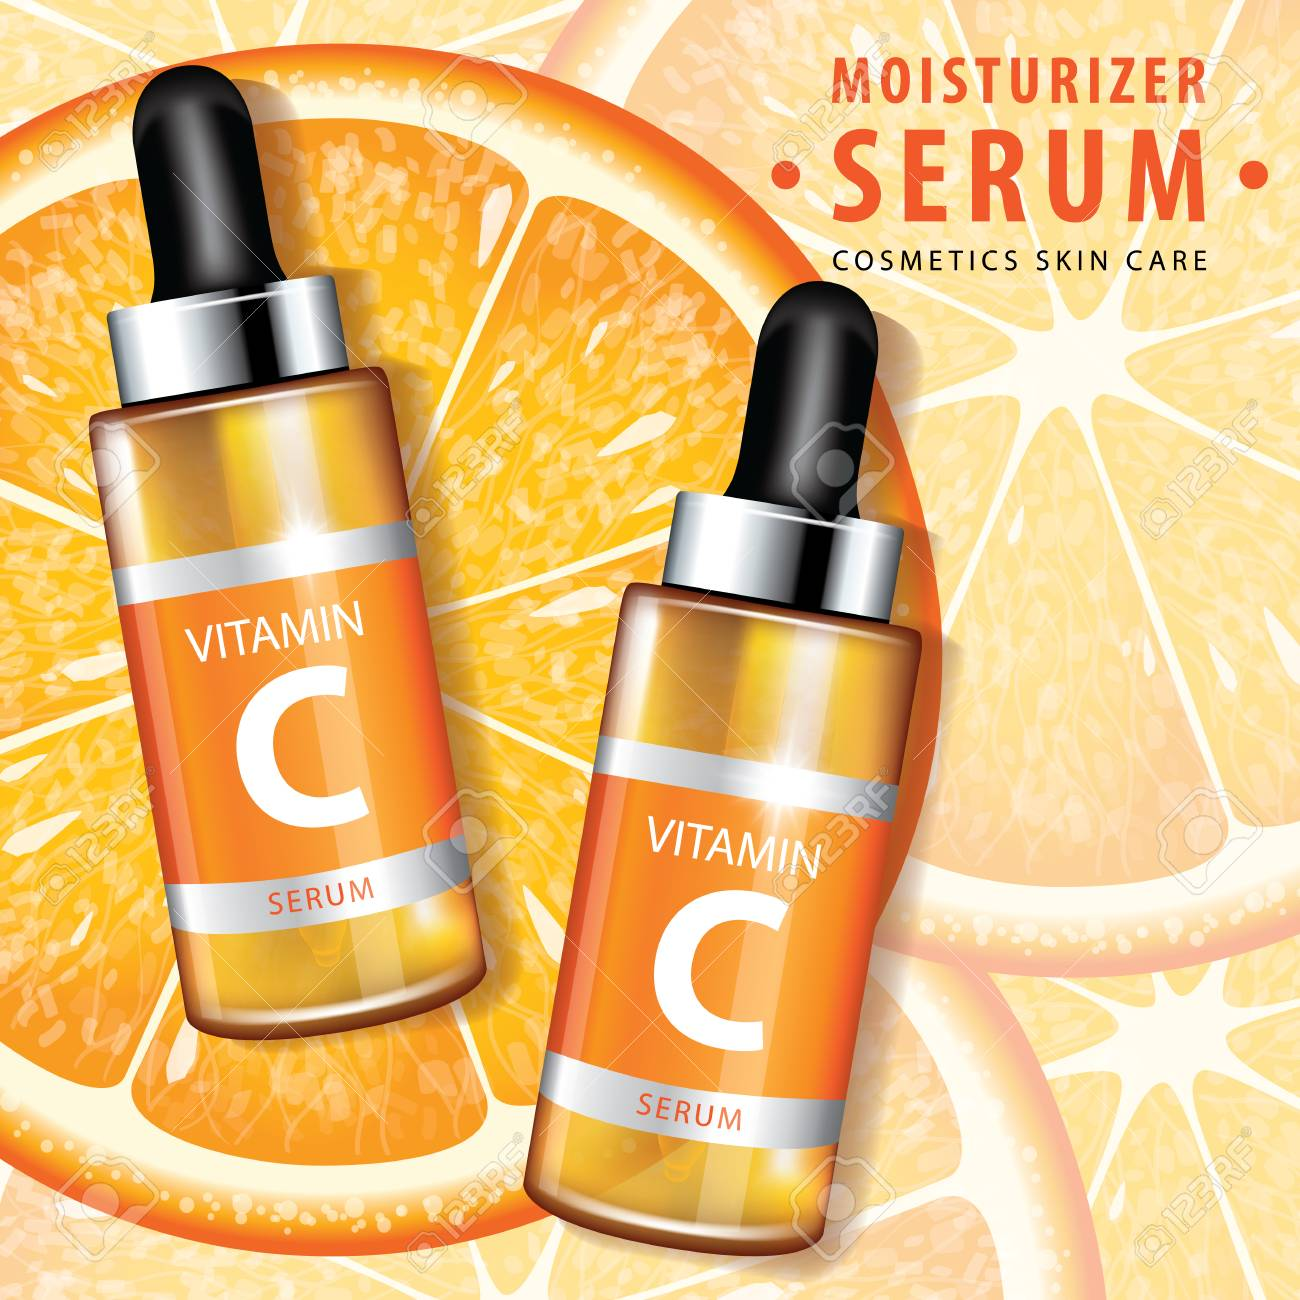 Orange Collagen Vitamin Skin Care Serum Banner Vector Illustration Royalty Free Cliparts Vectors And Stock Illustration Image 113127627